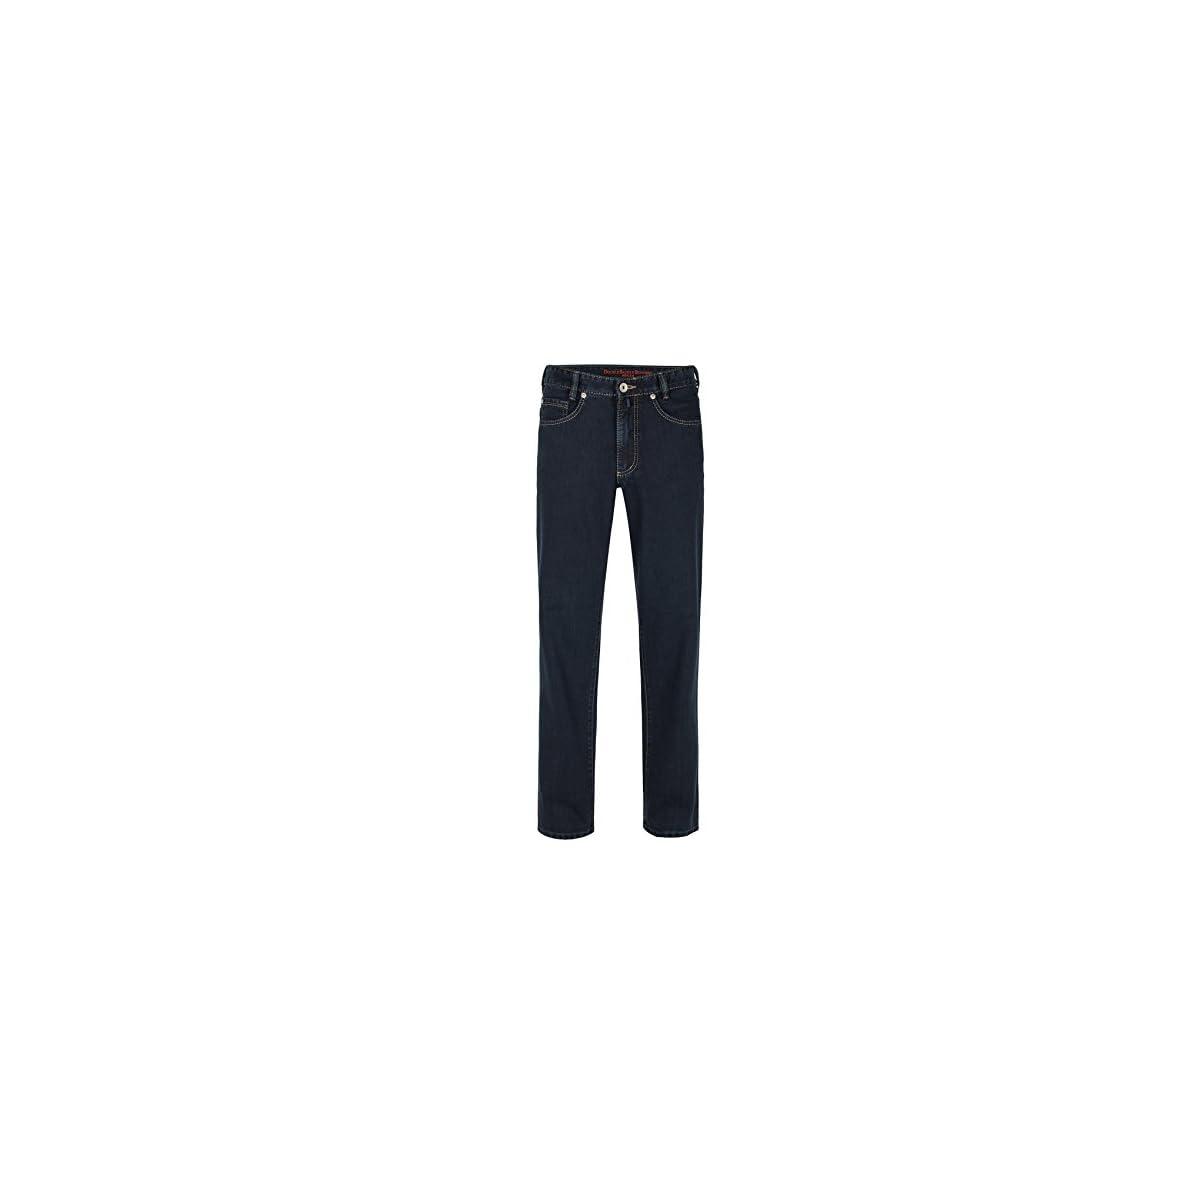 Joker Jeans Clark 2243/0243 Dark Blue